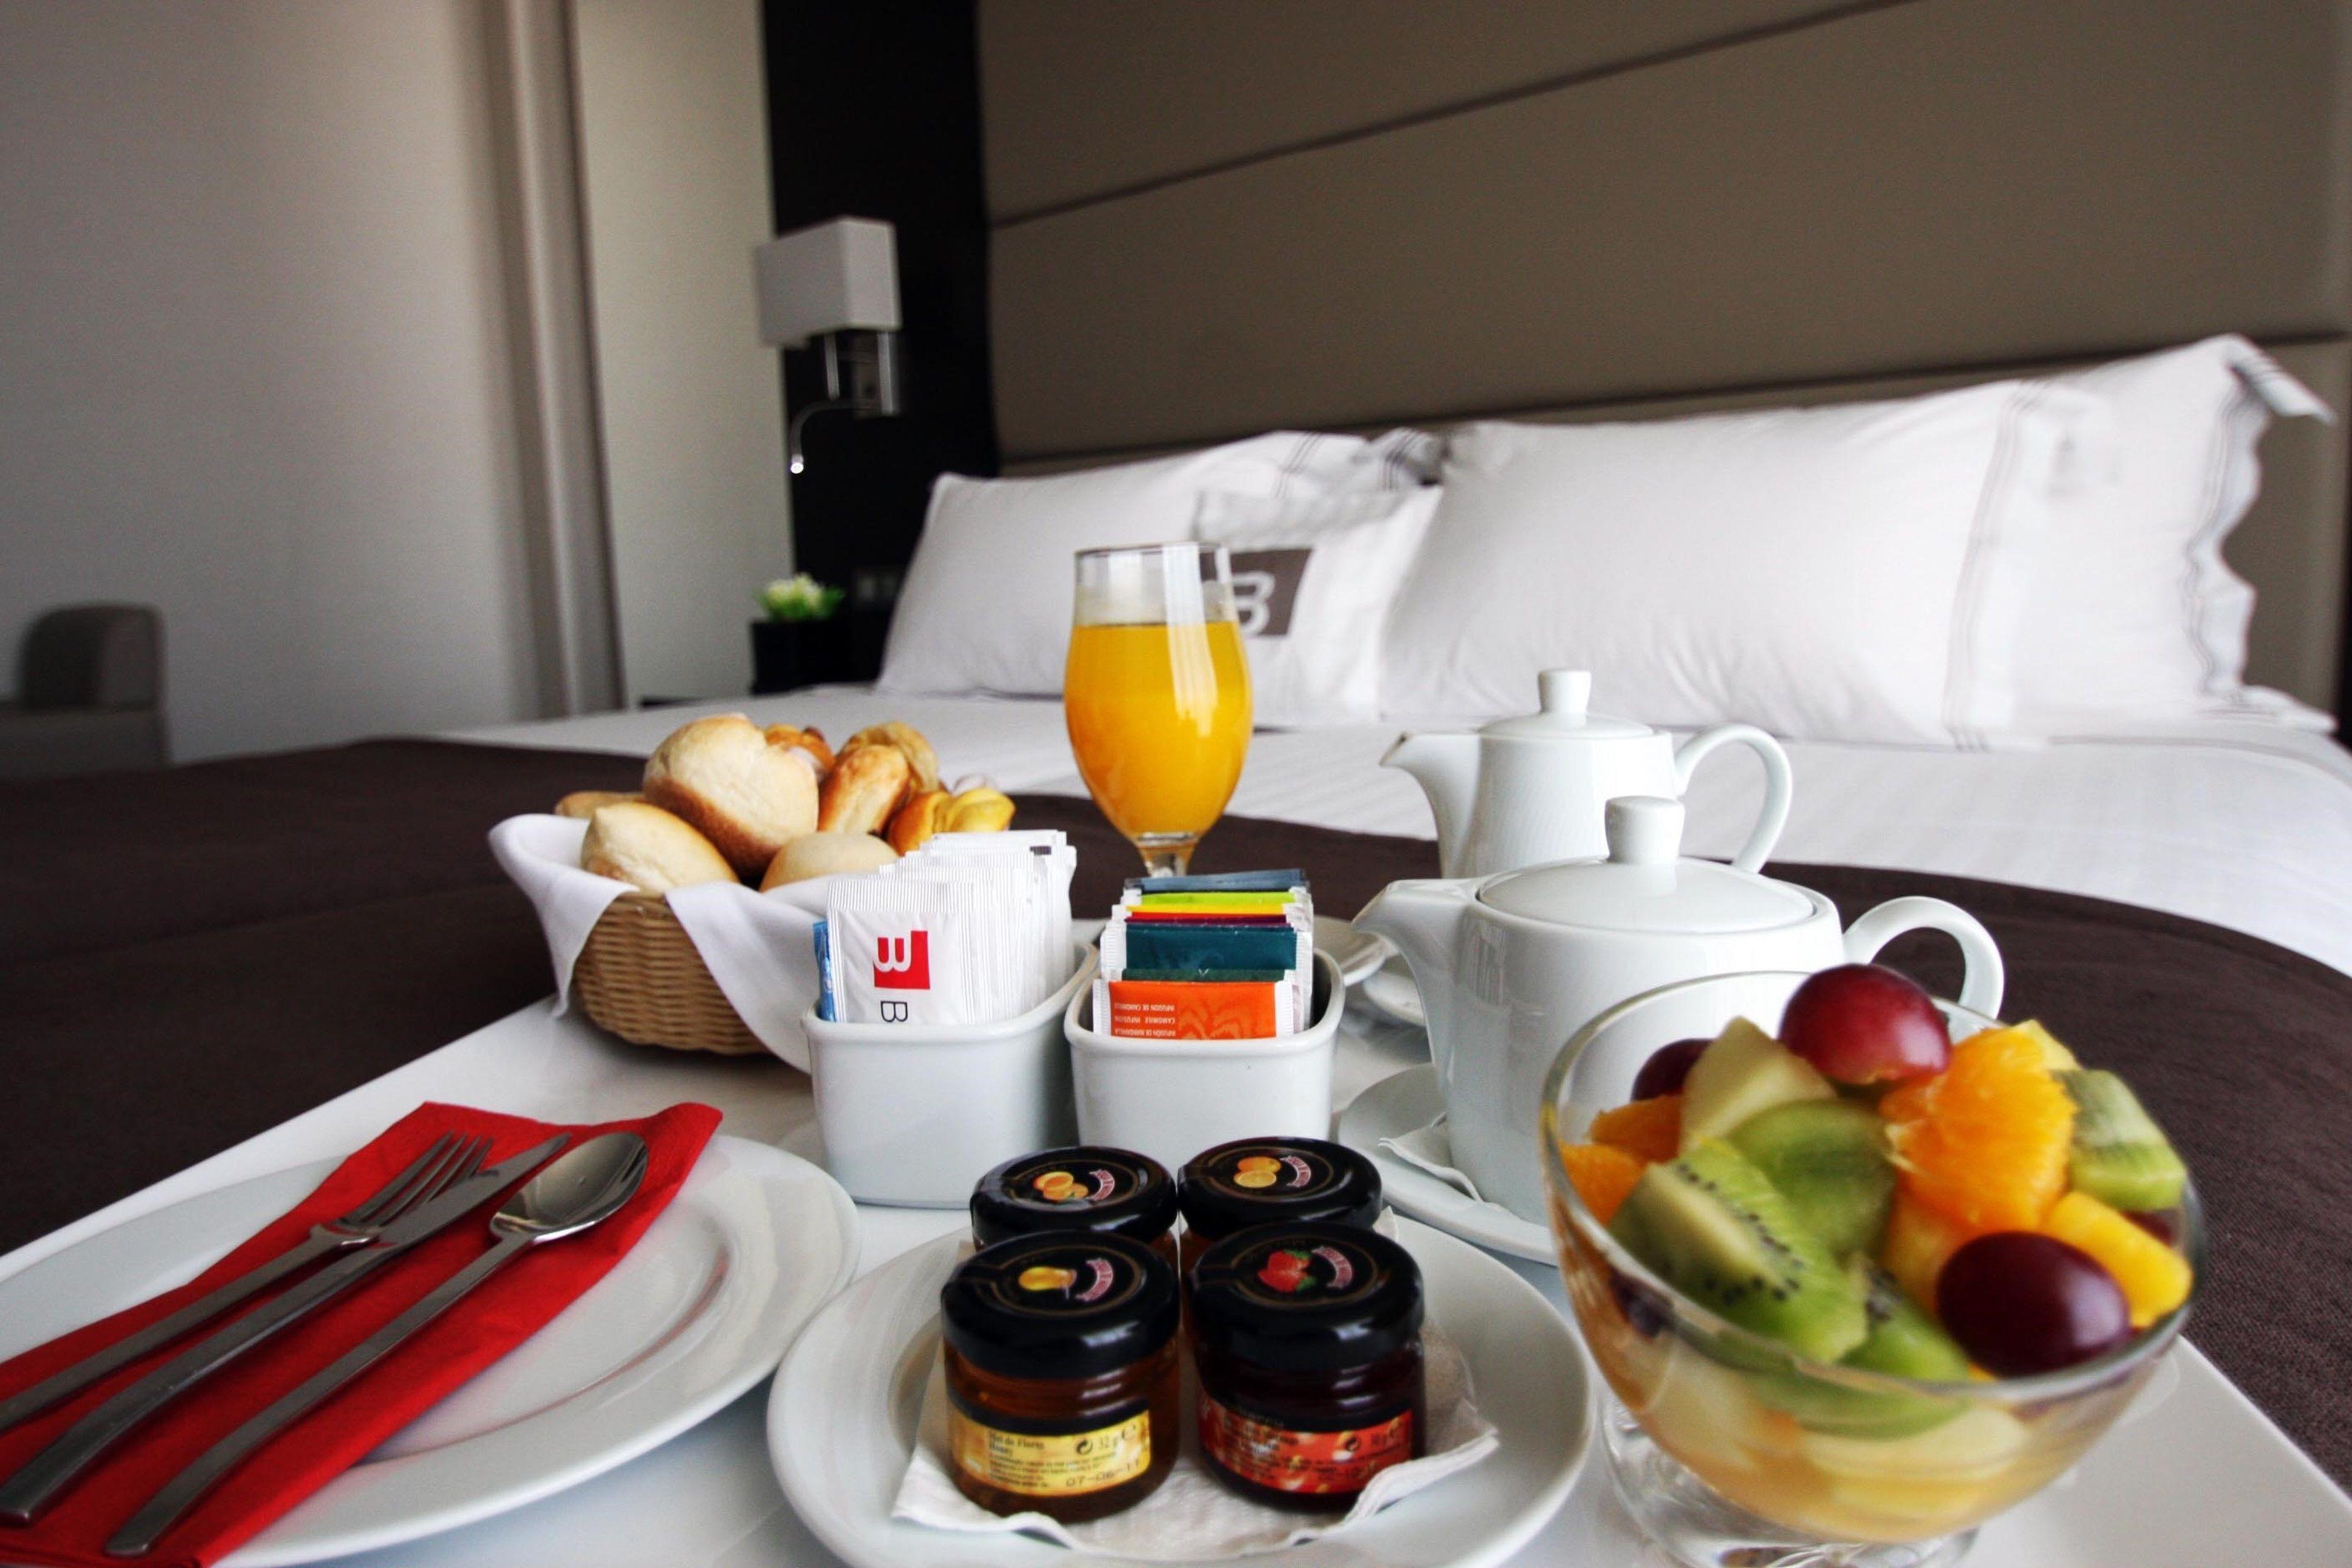 042_bessahotel_room service 123